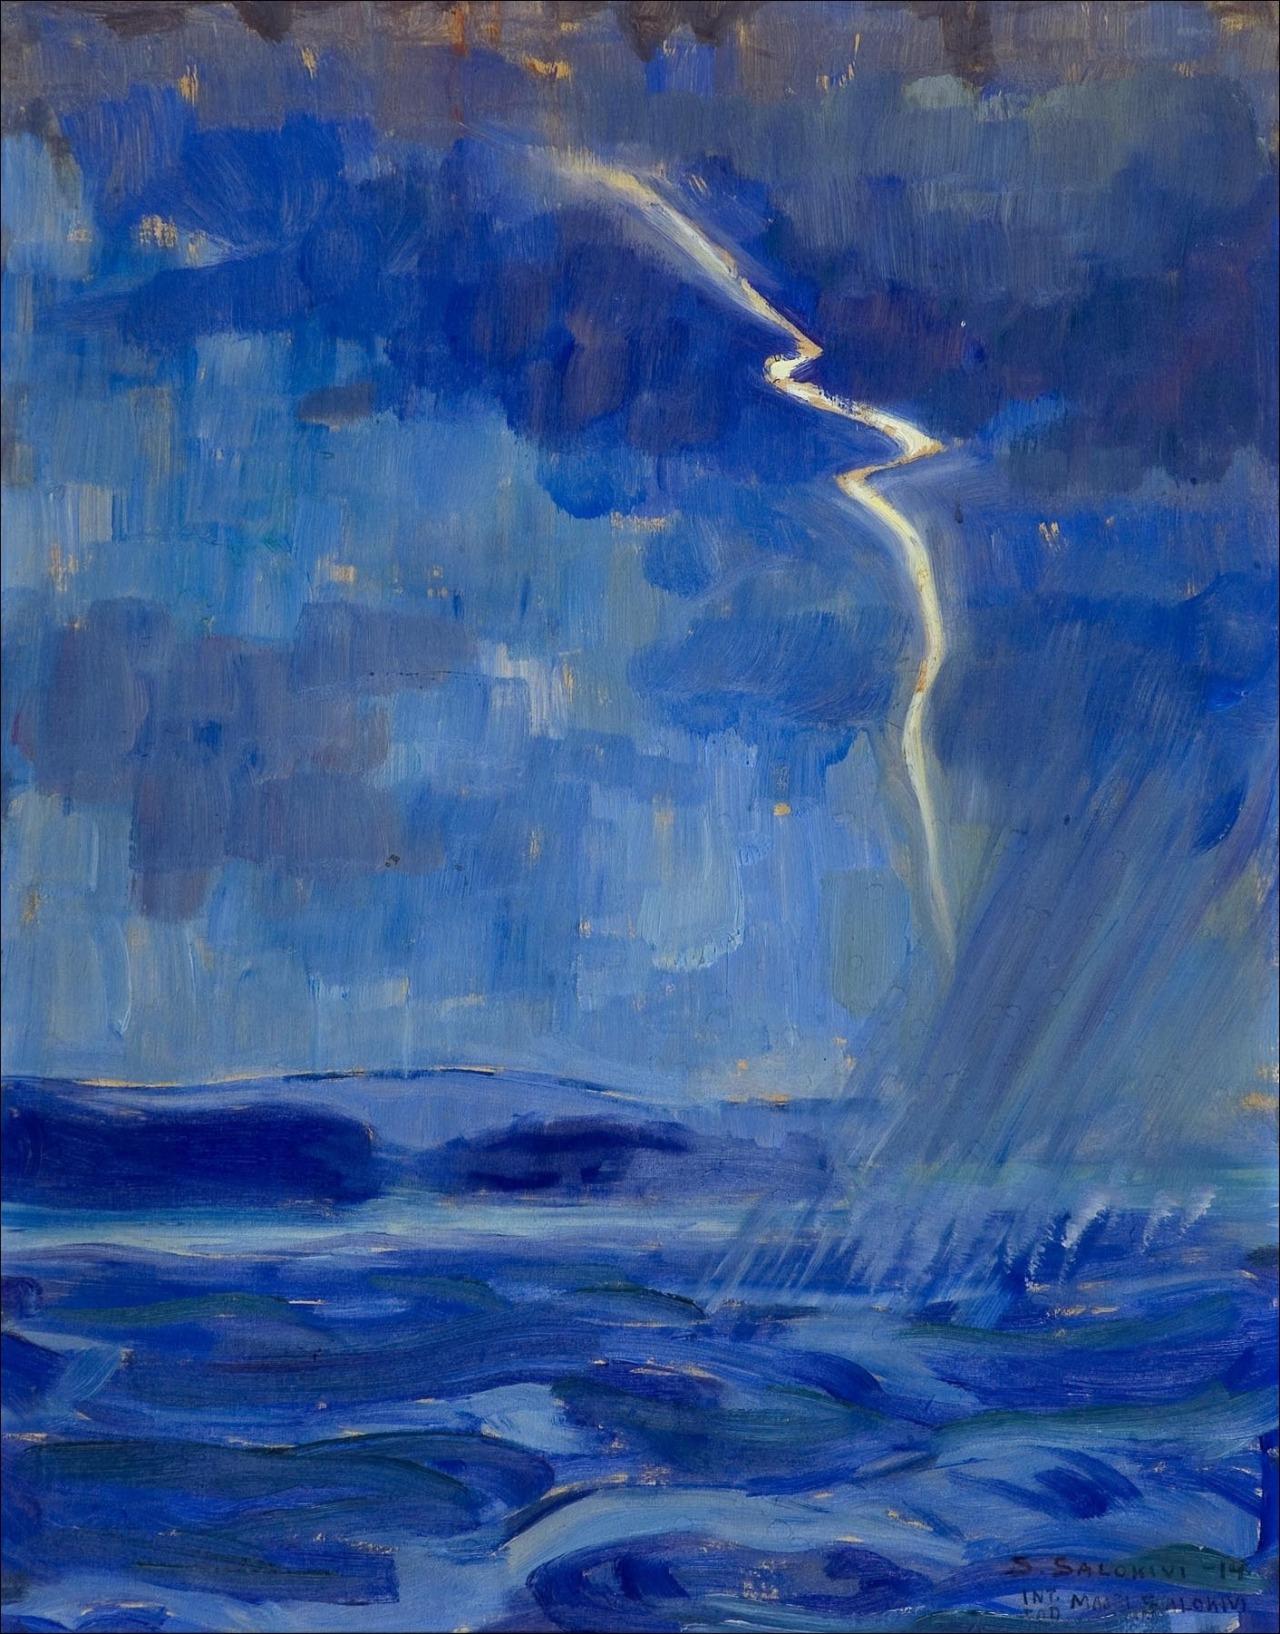 huariqueje: Storm at Sea  -  Santeri Salokivi 1914 Finnish 1886-1940 Oil on panel, 42 x 33 cm.